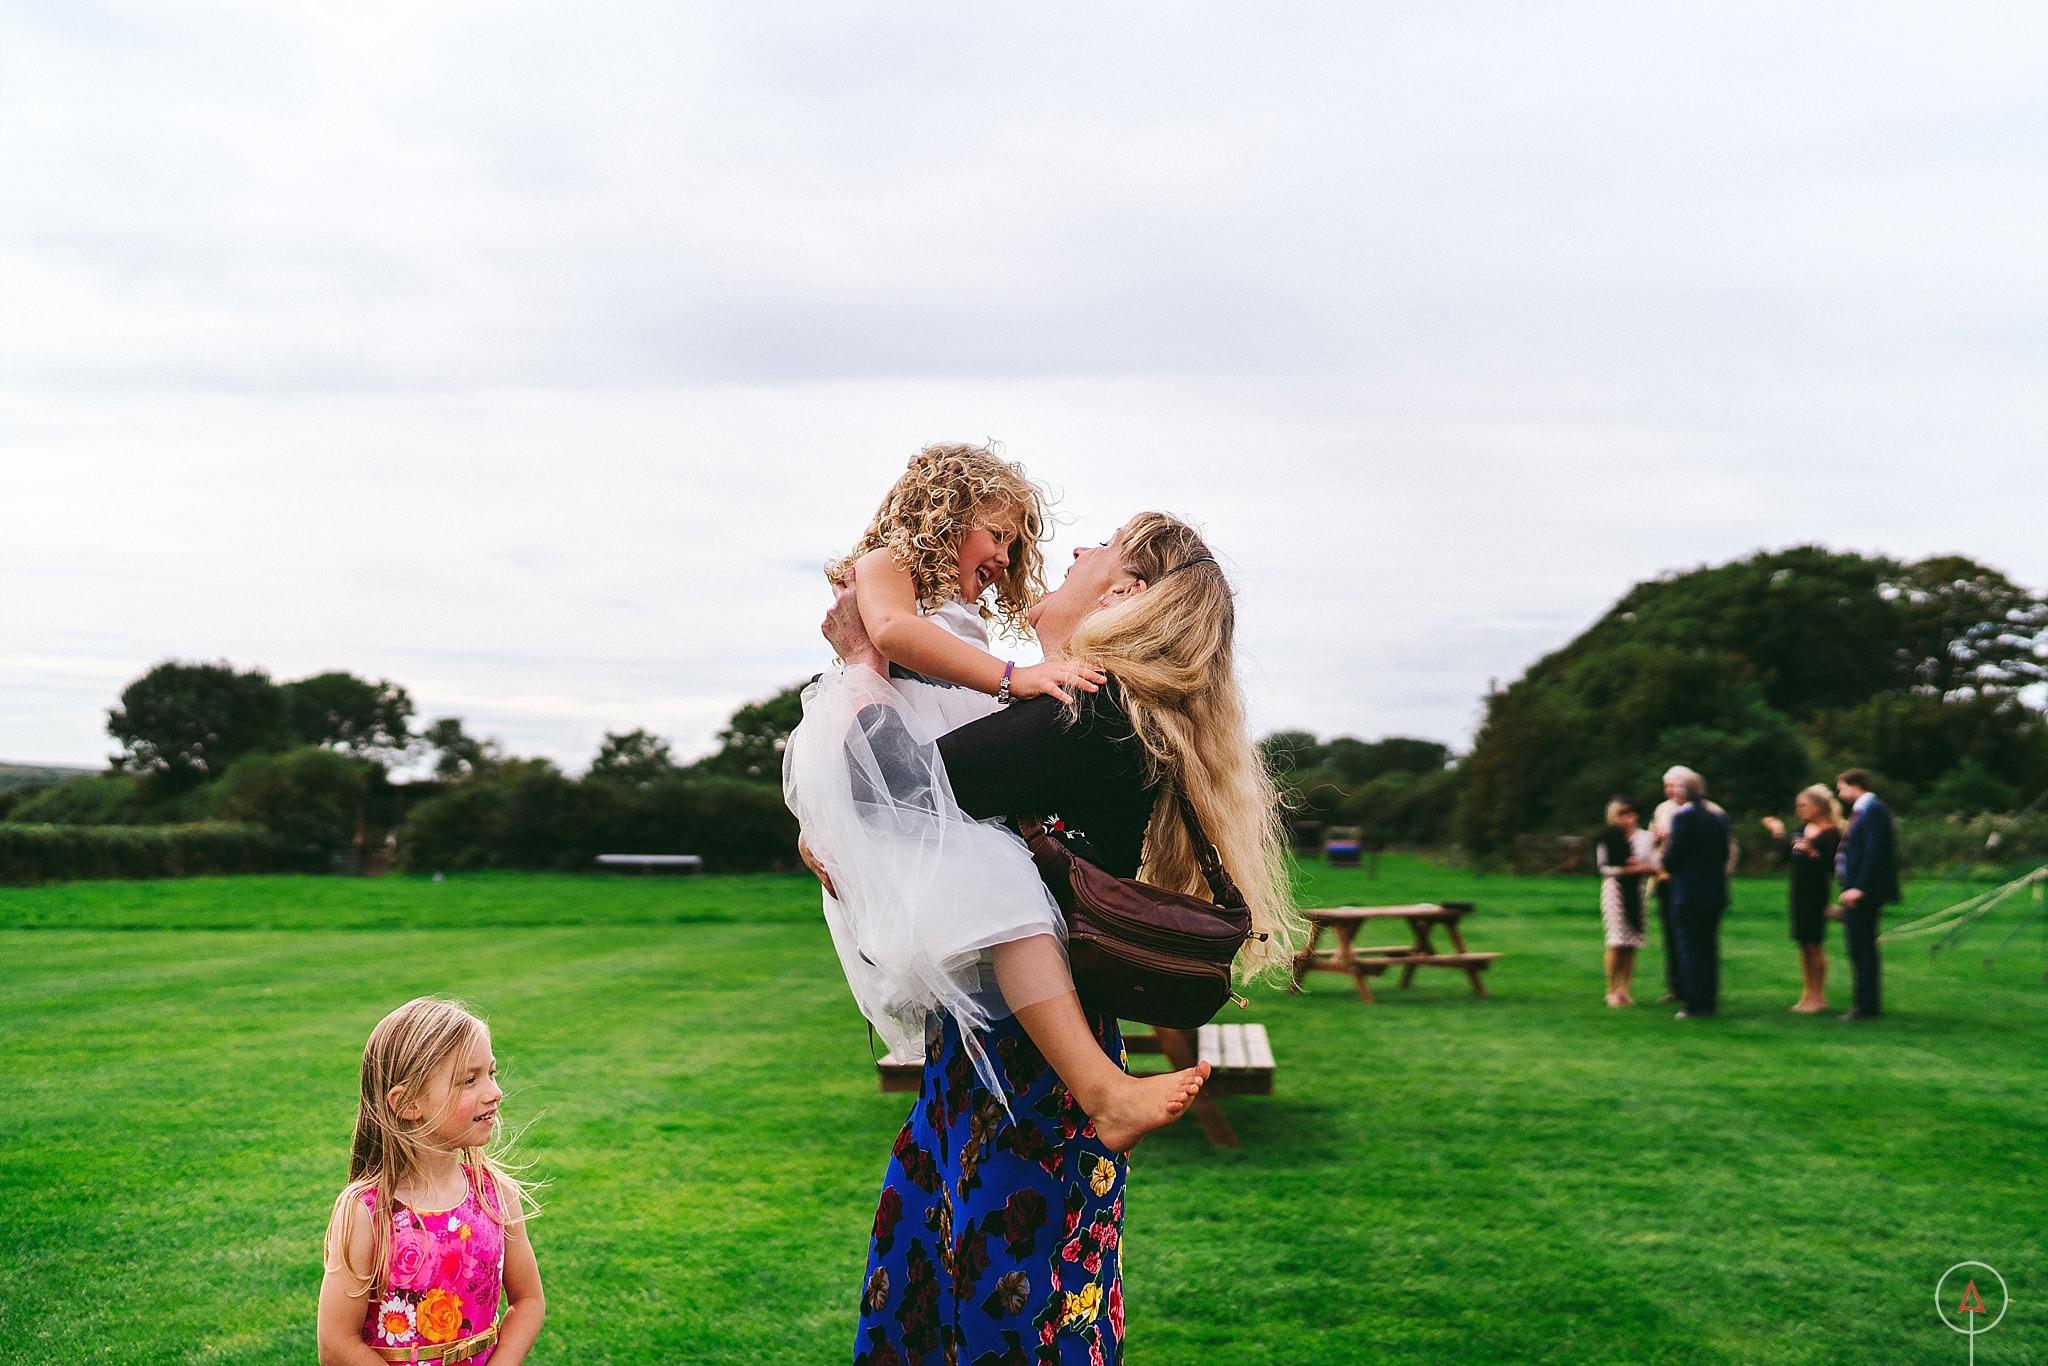 cardiff-wedding-photographer-aga-tomaszek_0391